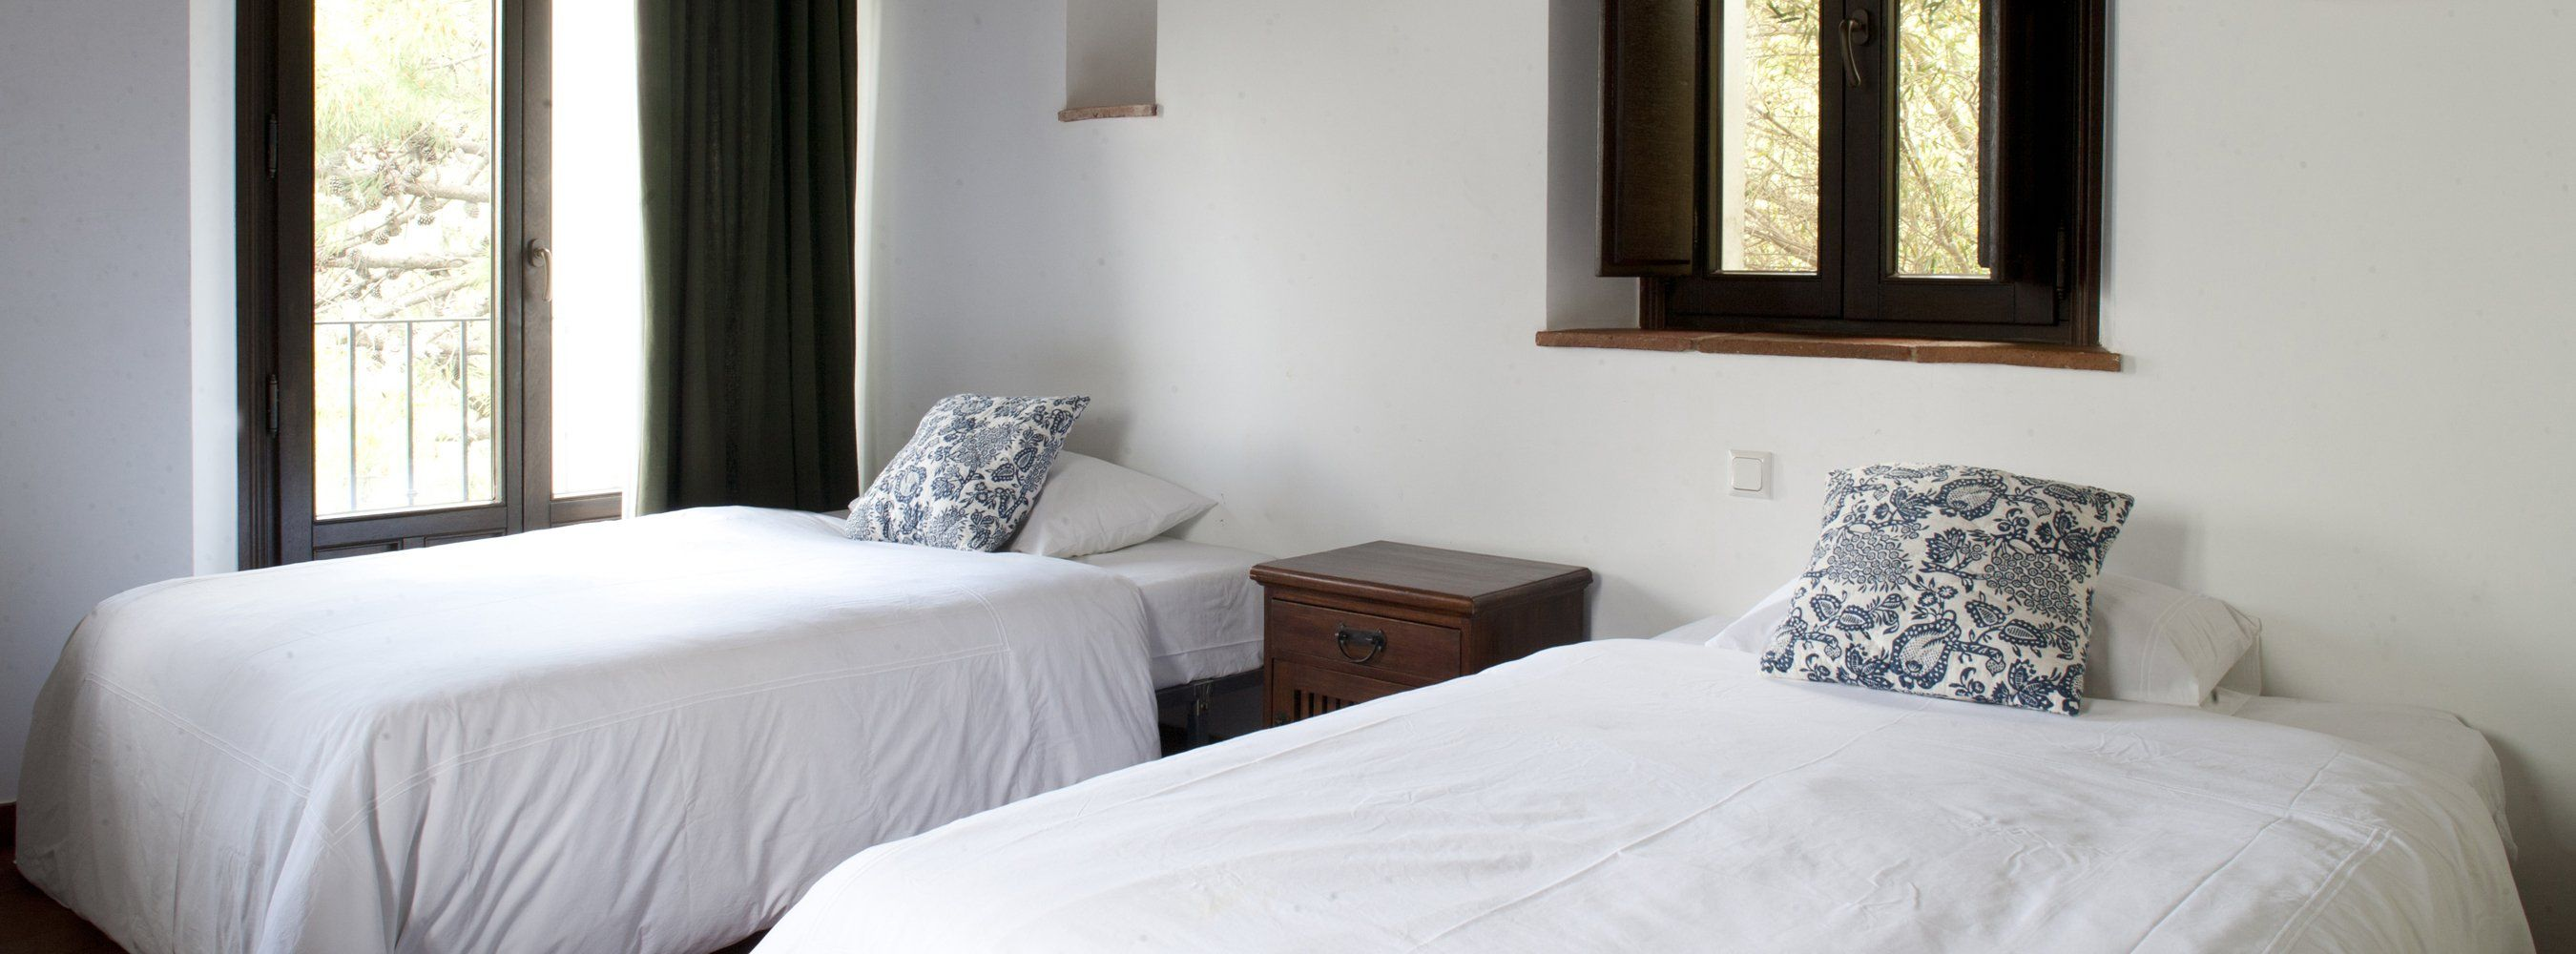 twin villa room